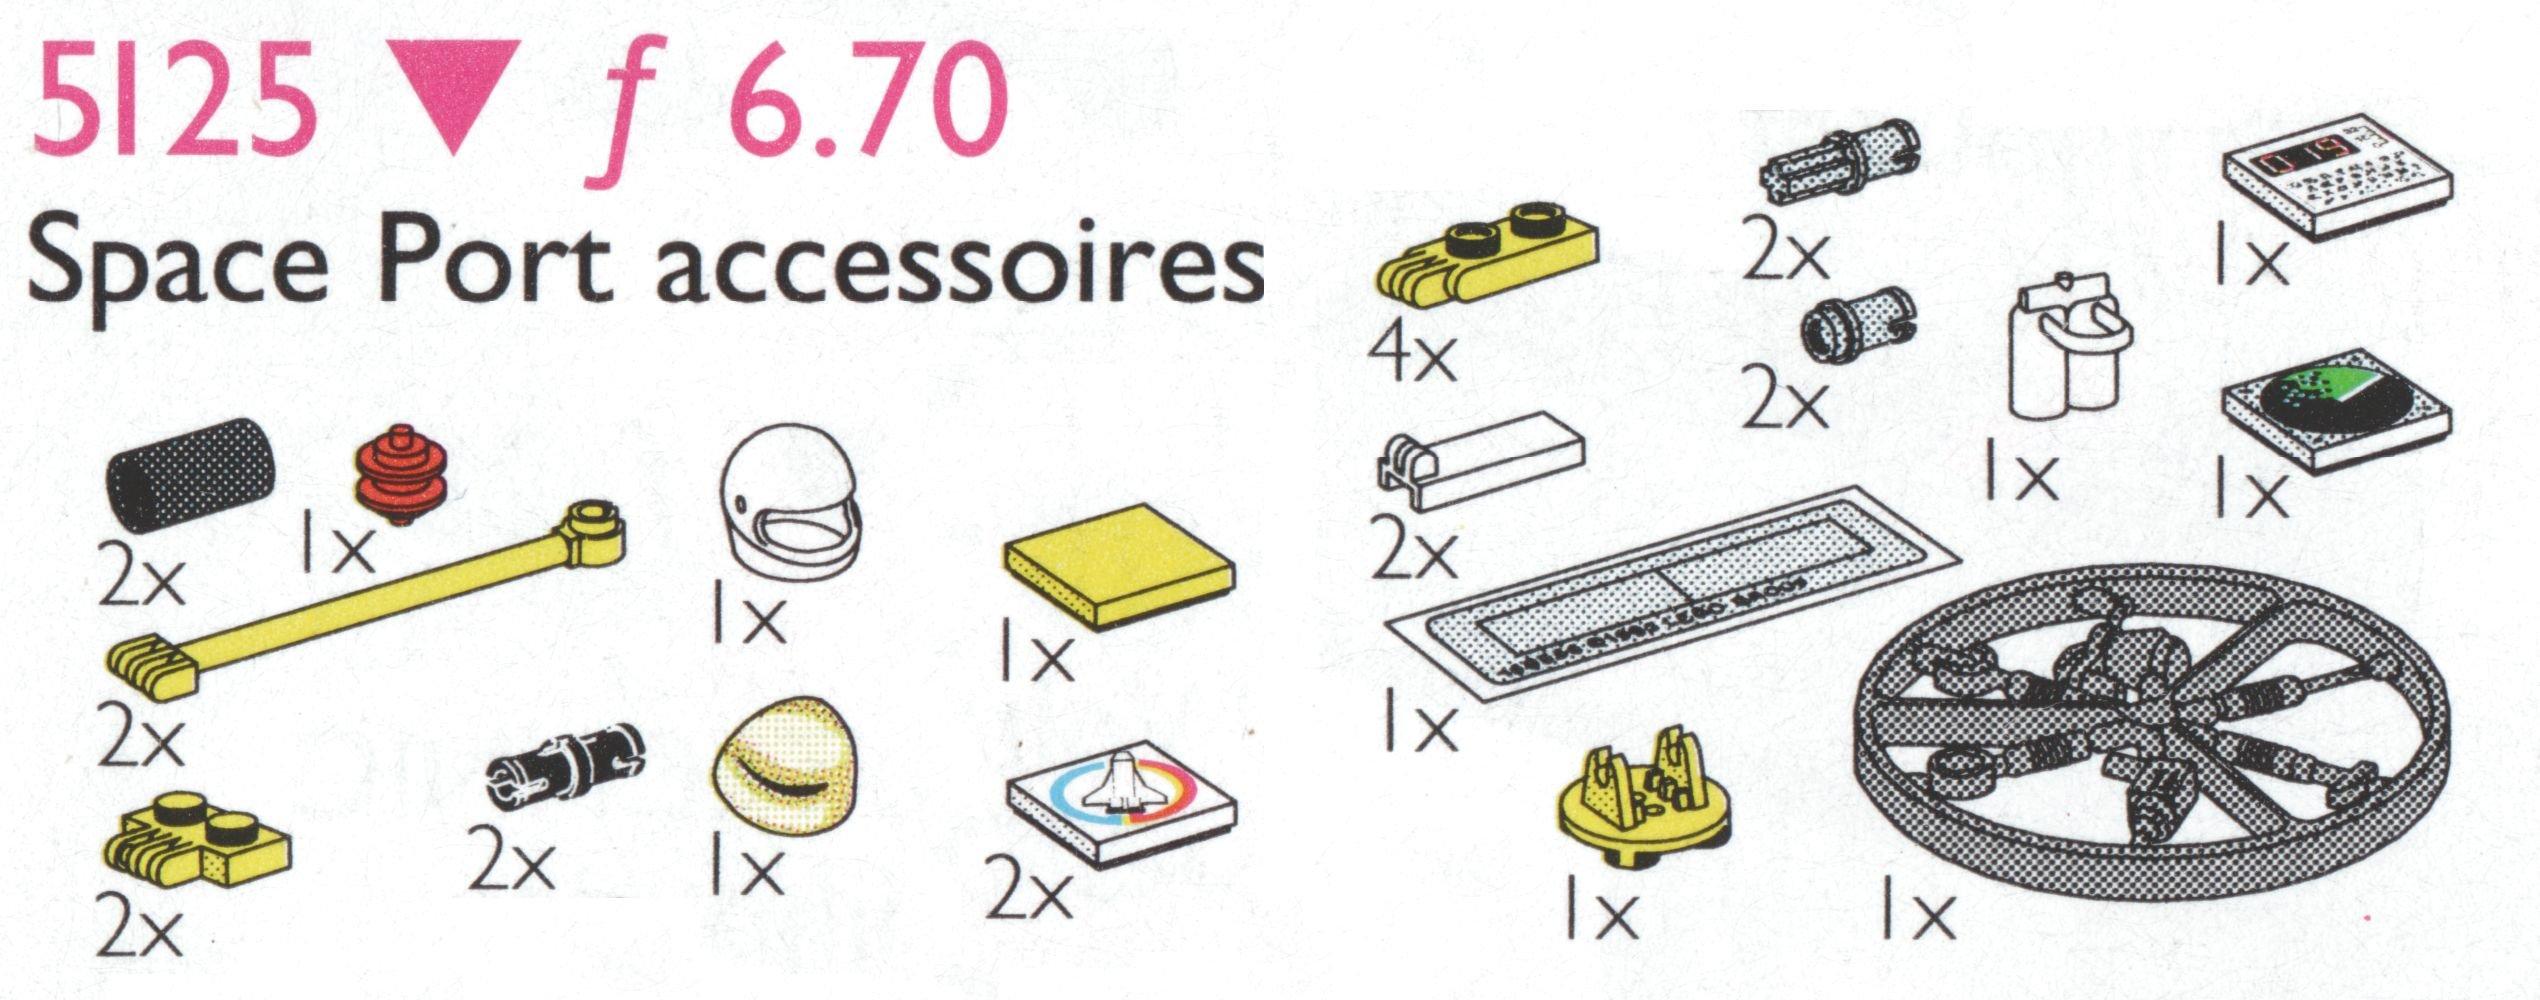 Spaceport Accessories